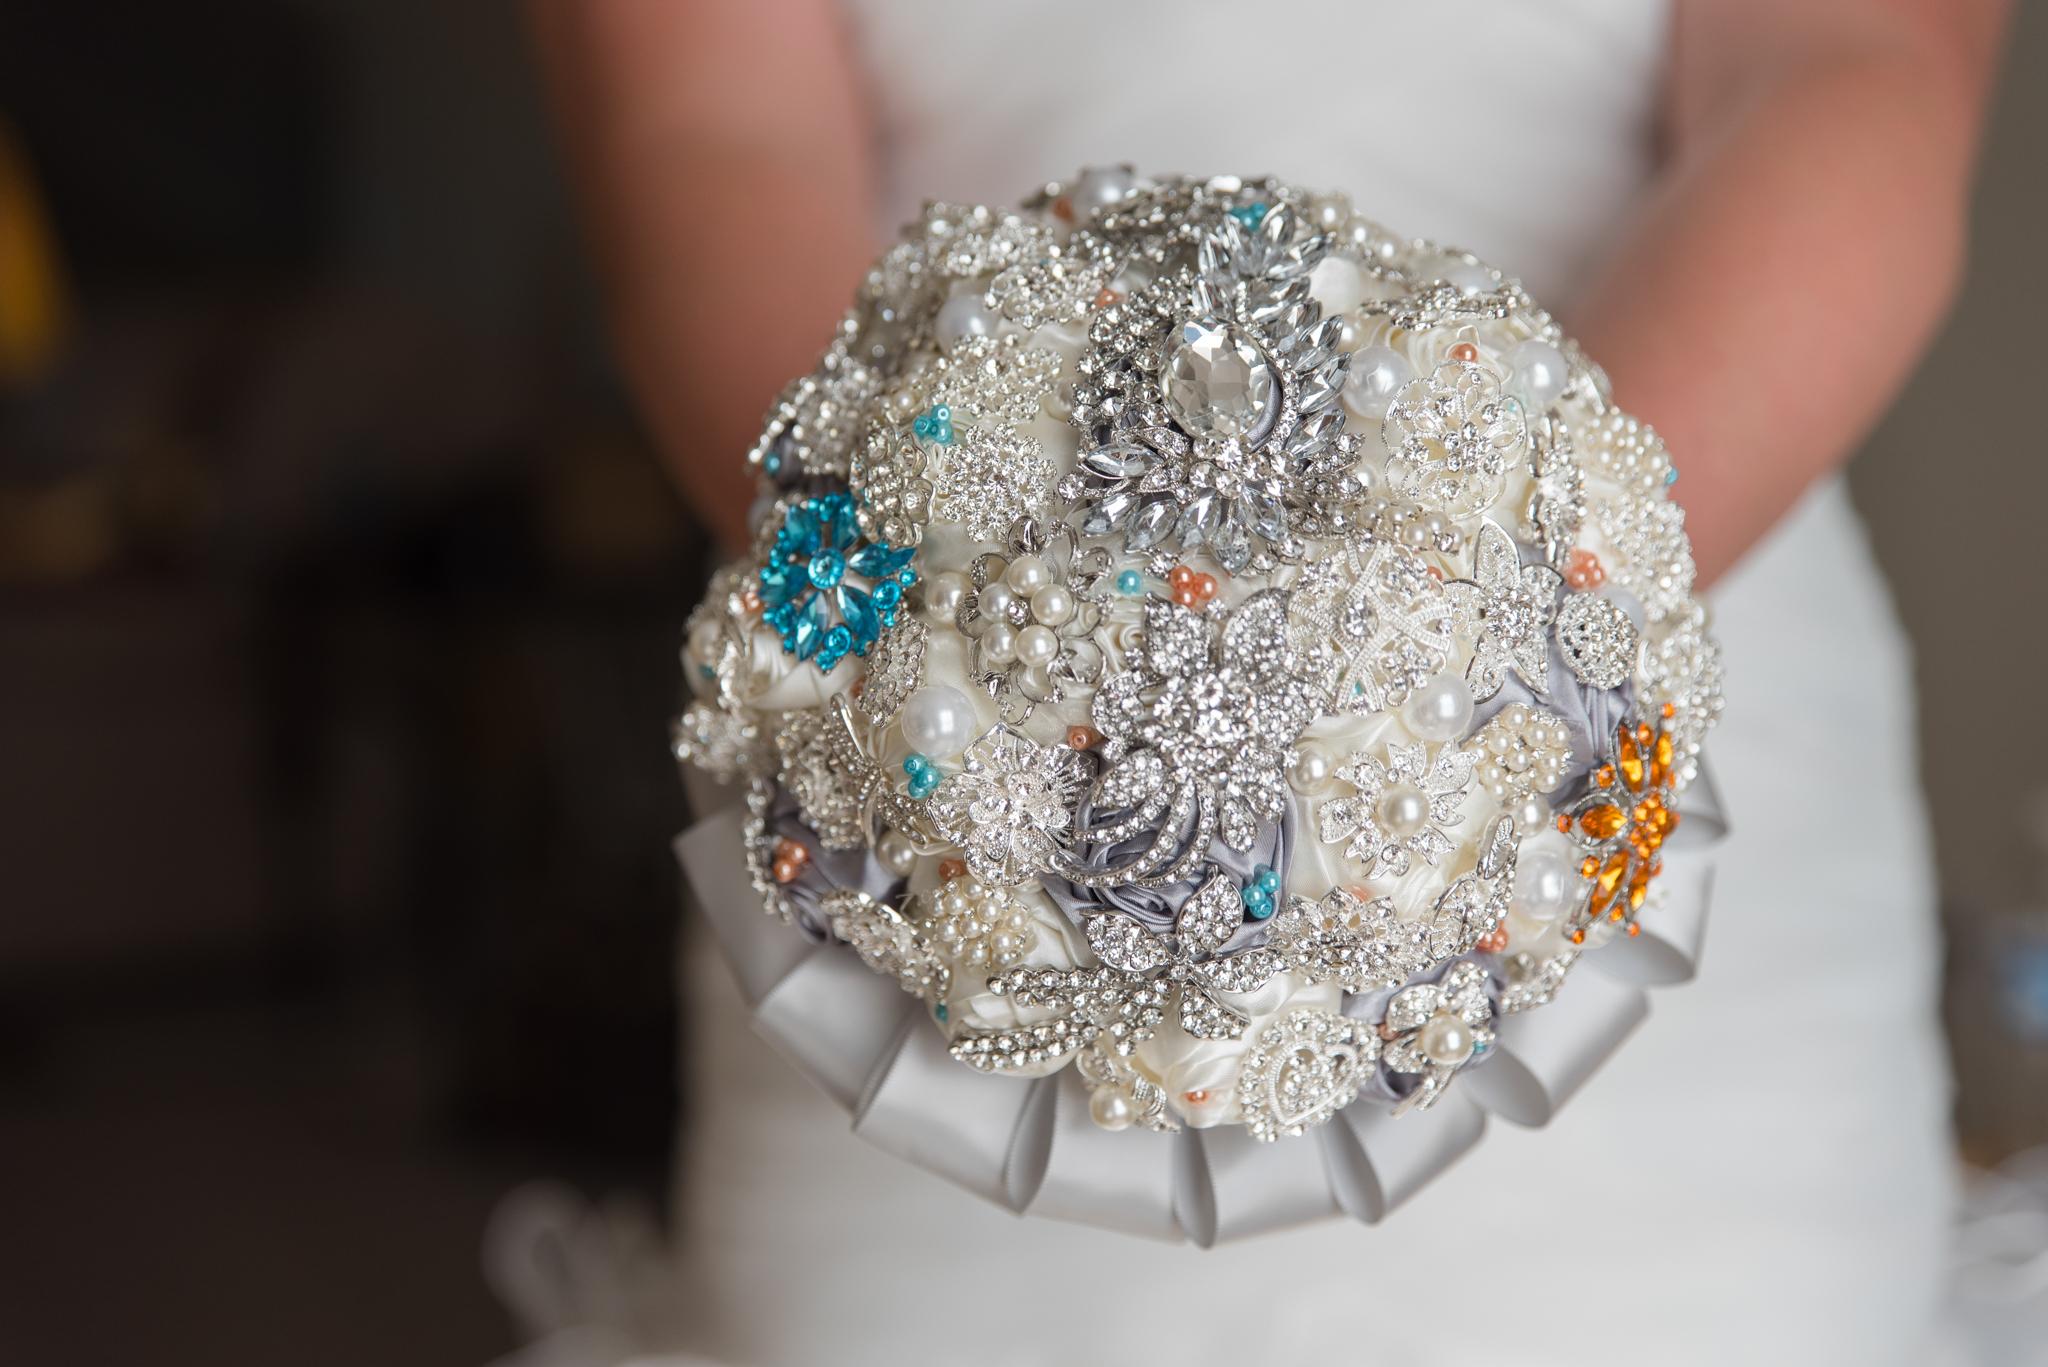 Kentucky bride, wedding bouquet, wedding flowers, KY bride, Kentucky wedding, Winchester KY wedding photography